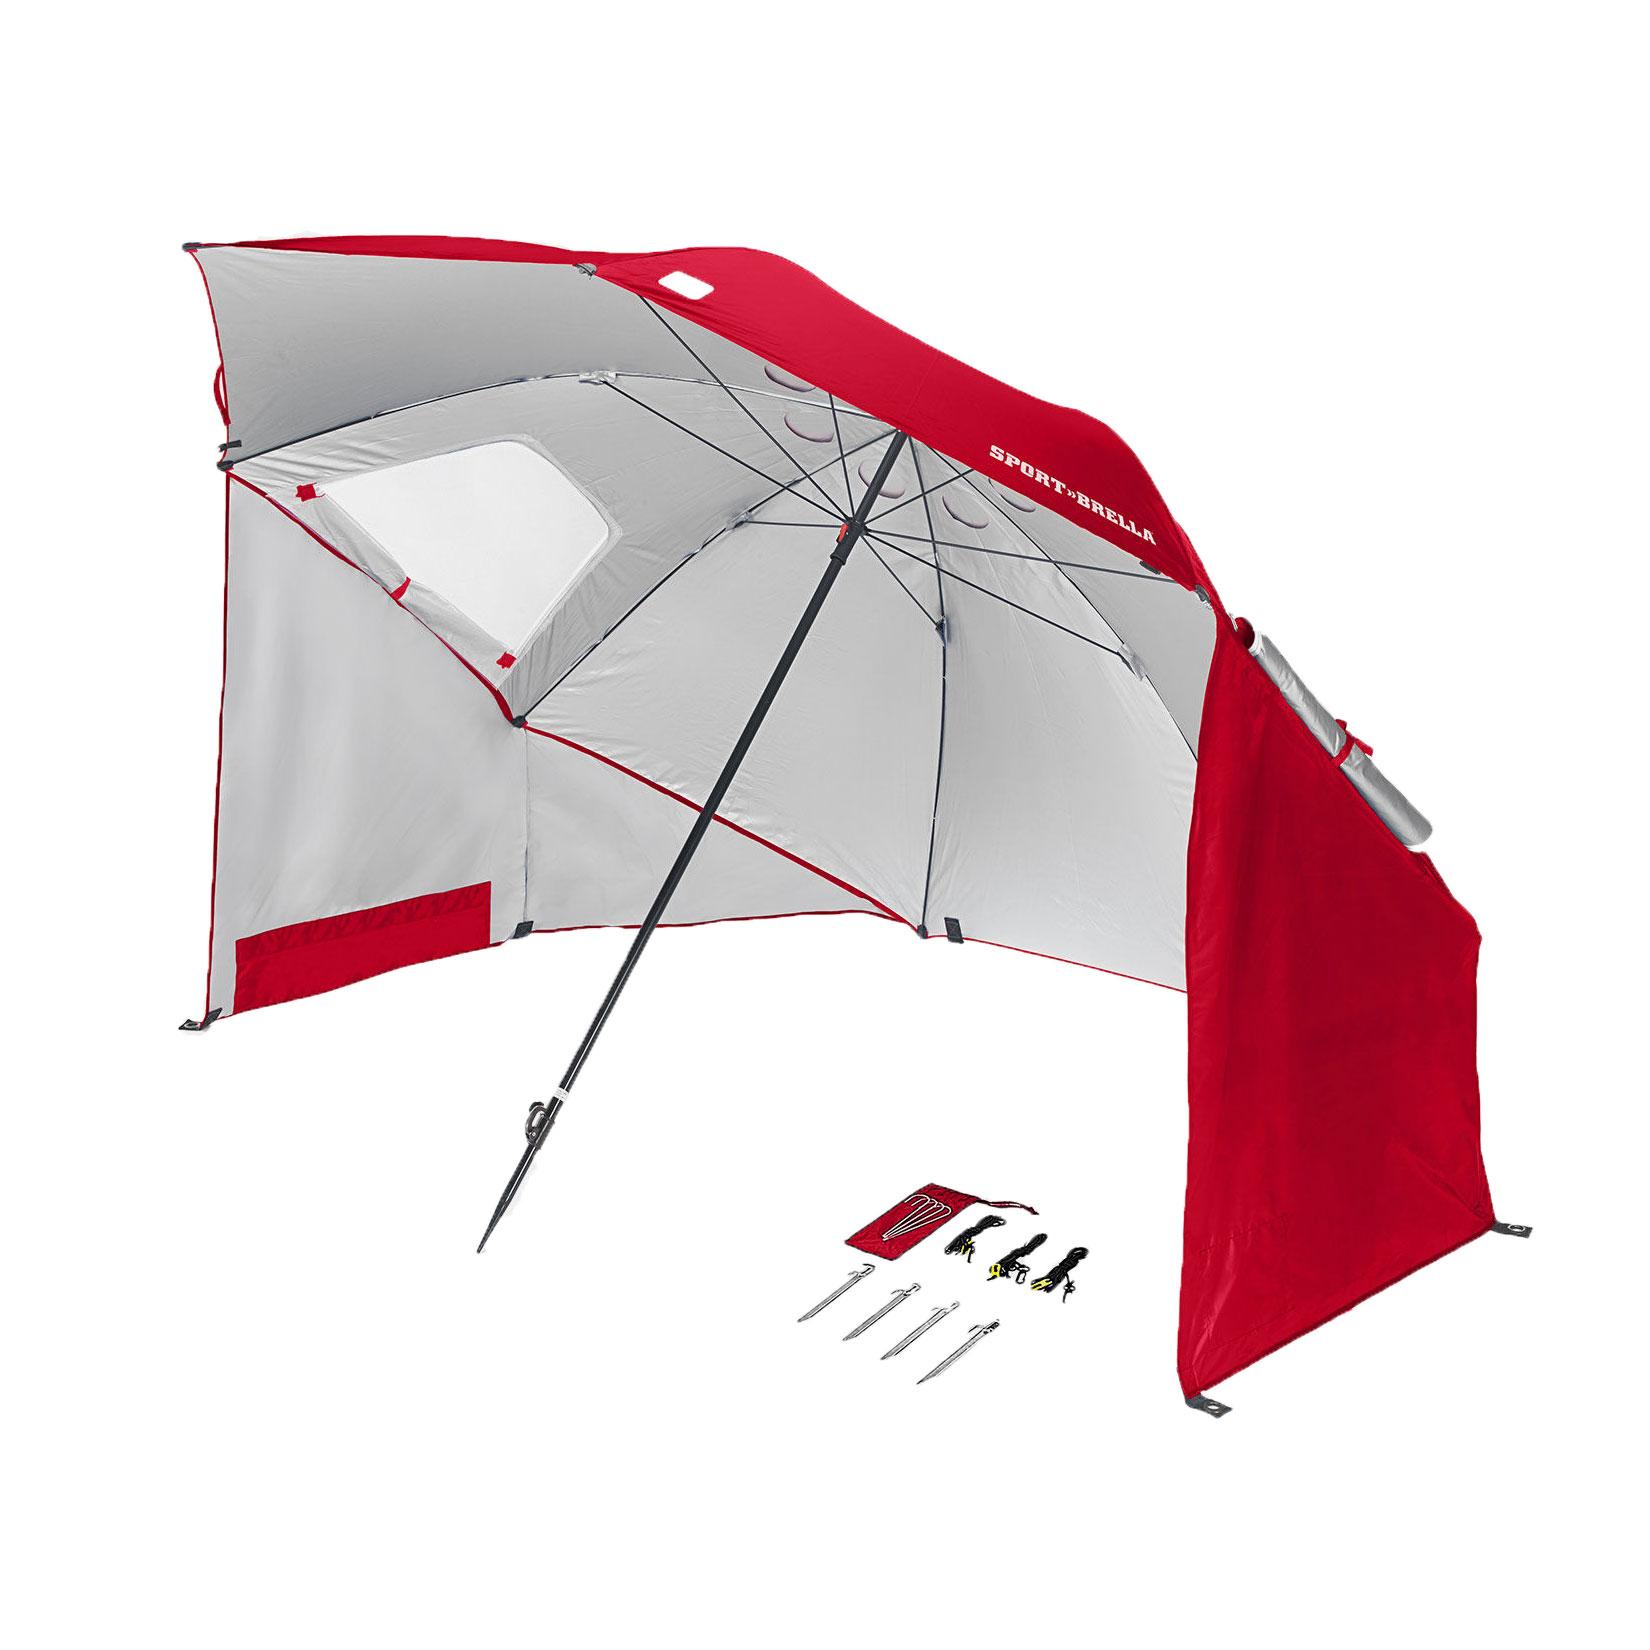 Sport Brella  Foot All Weather Portable Sun Tent Shelter Umbrella Canopy Red